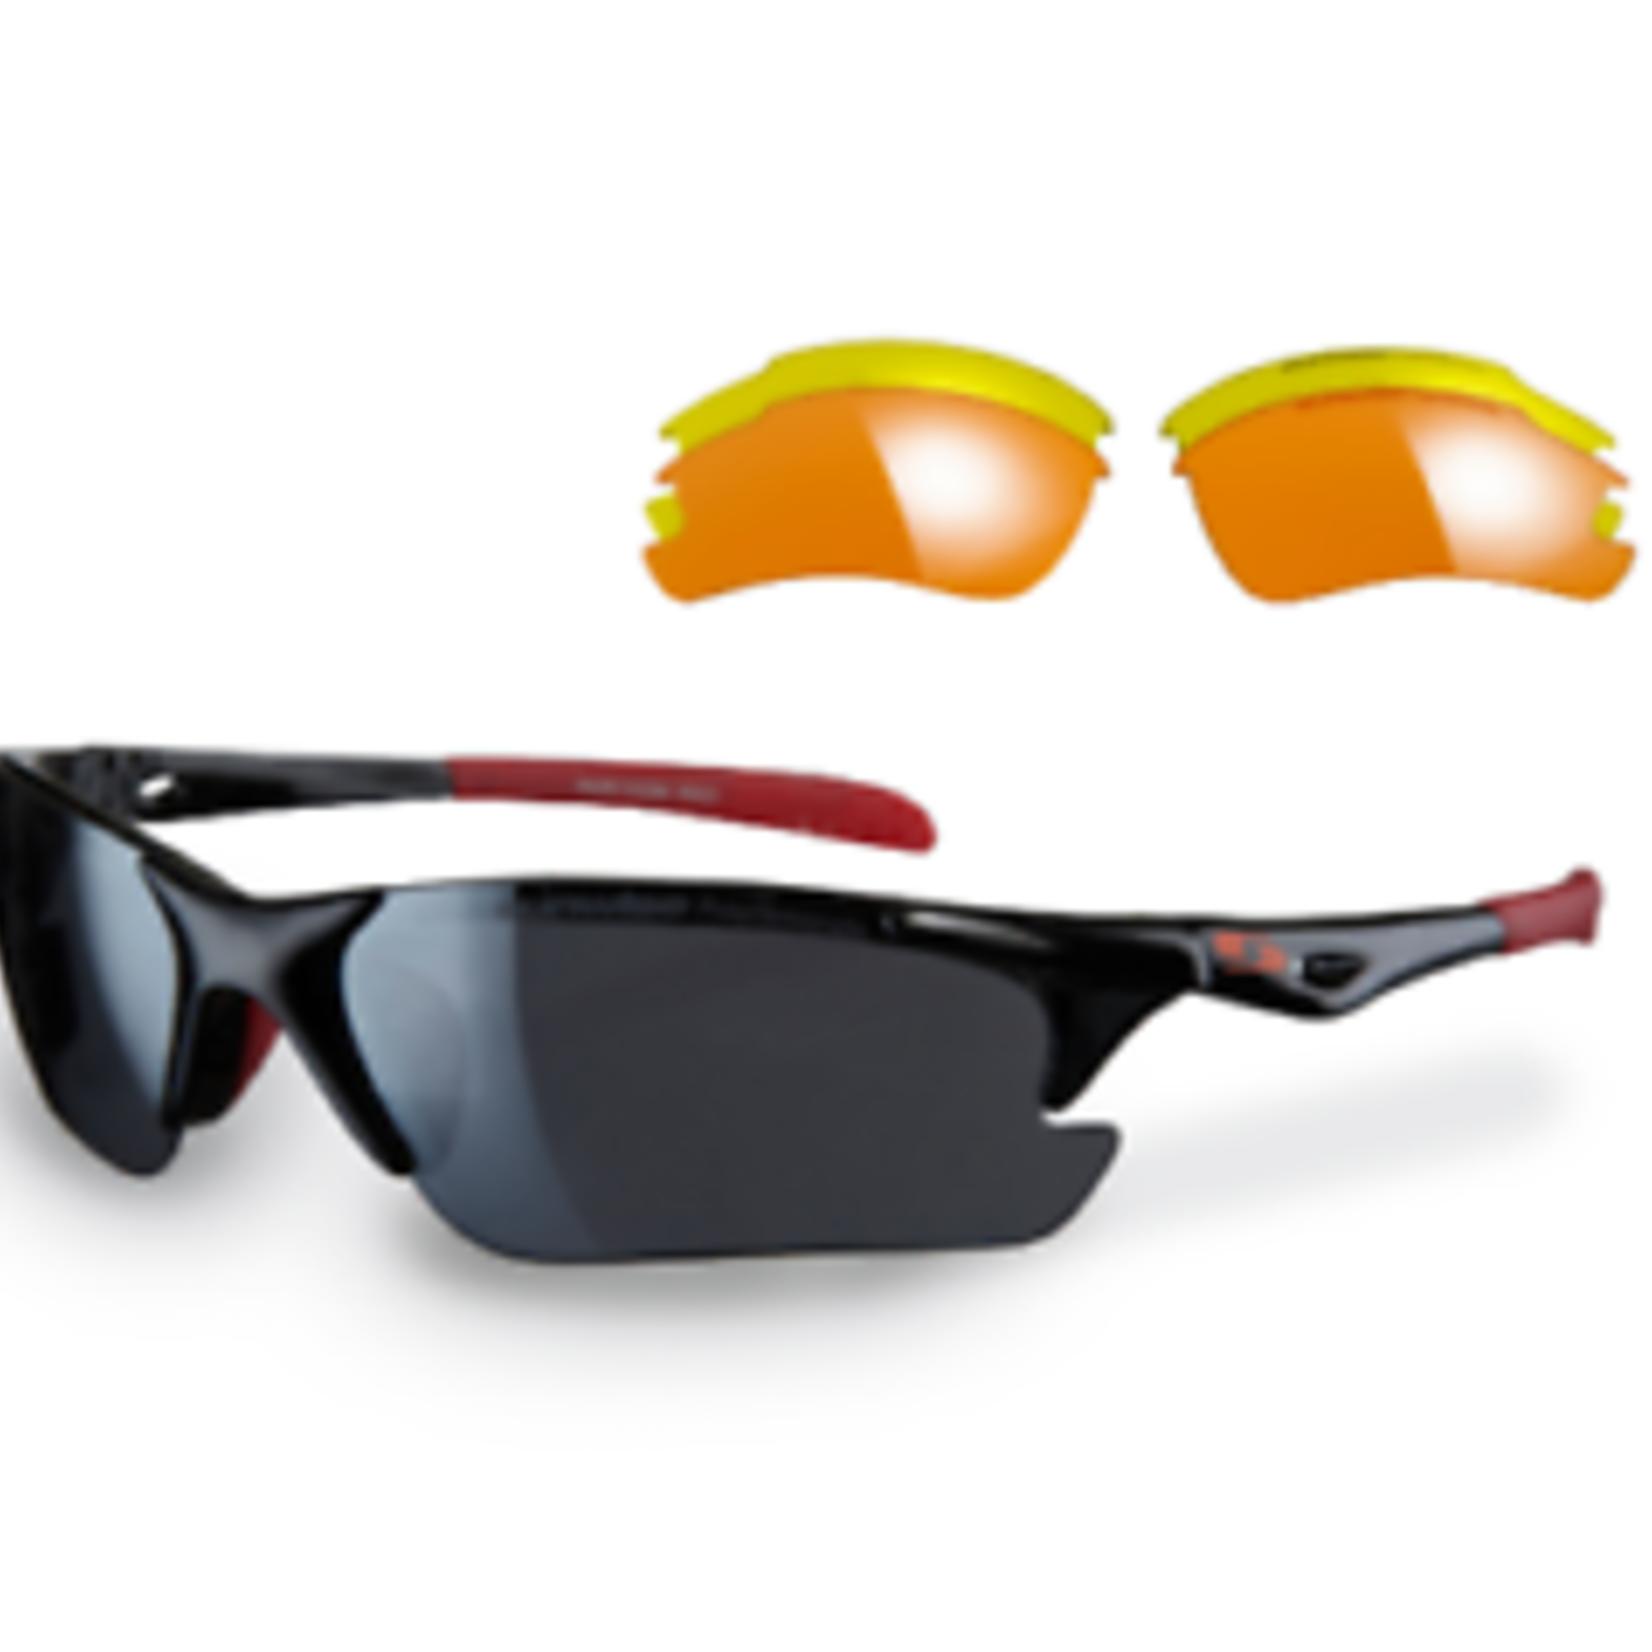 Sunwise Twister Sunglasses Black/Red